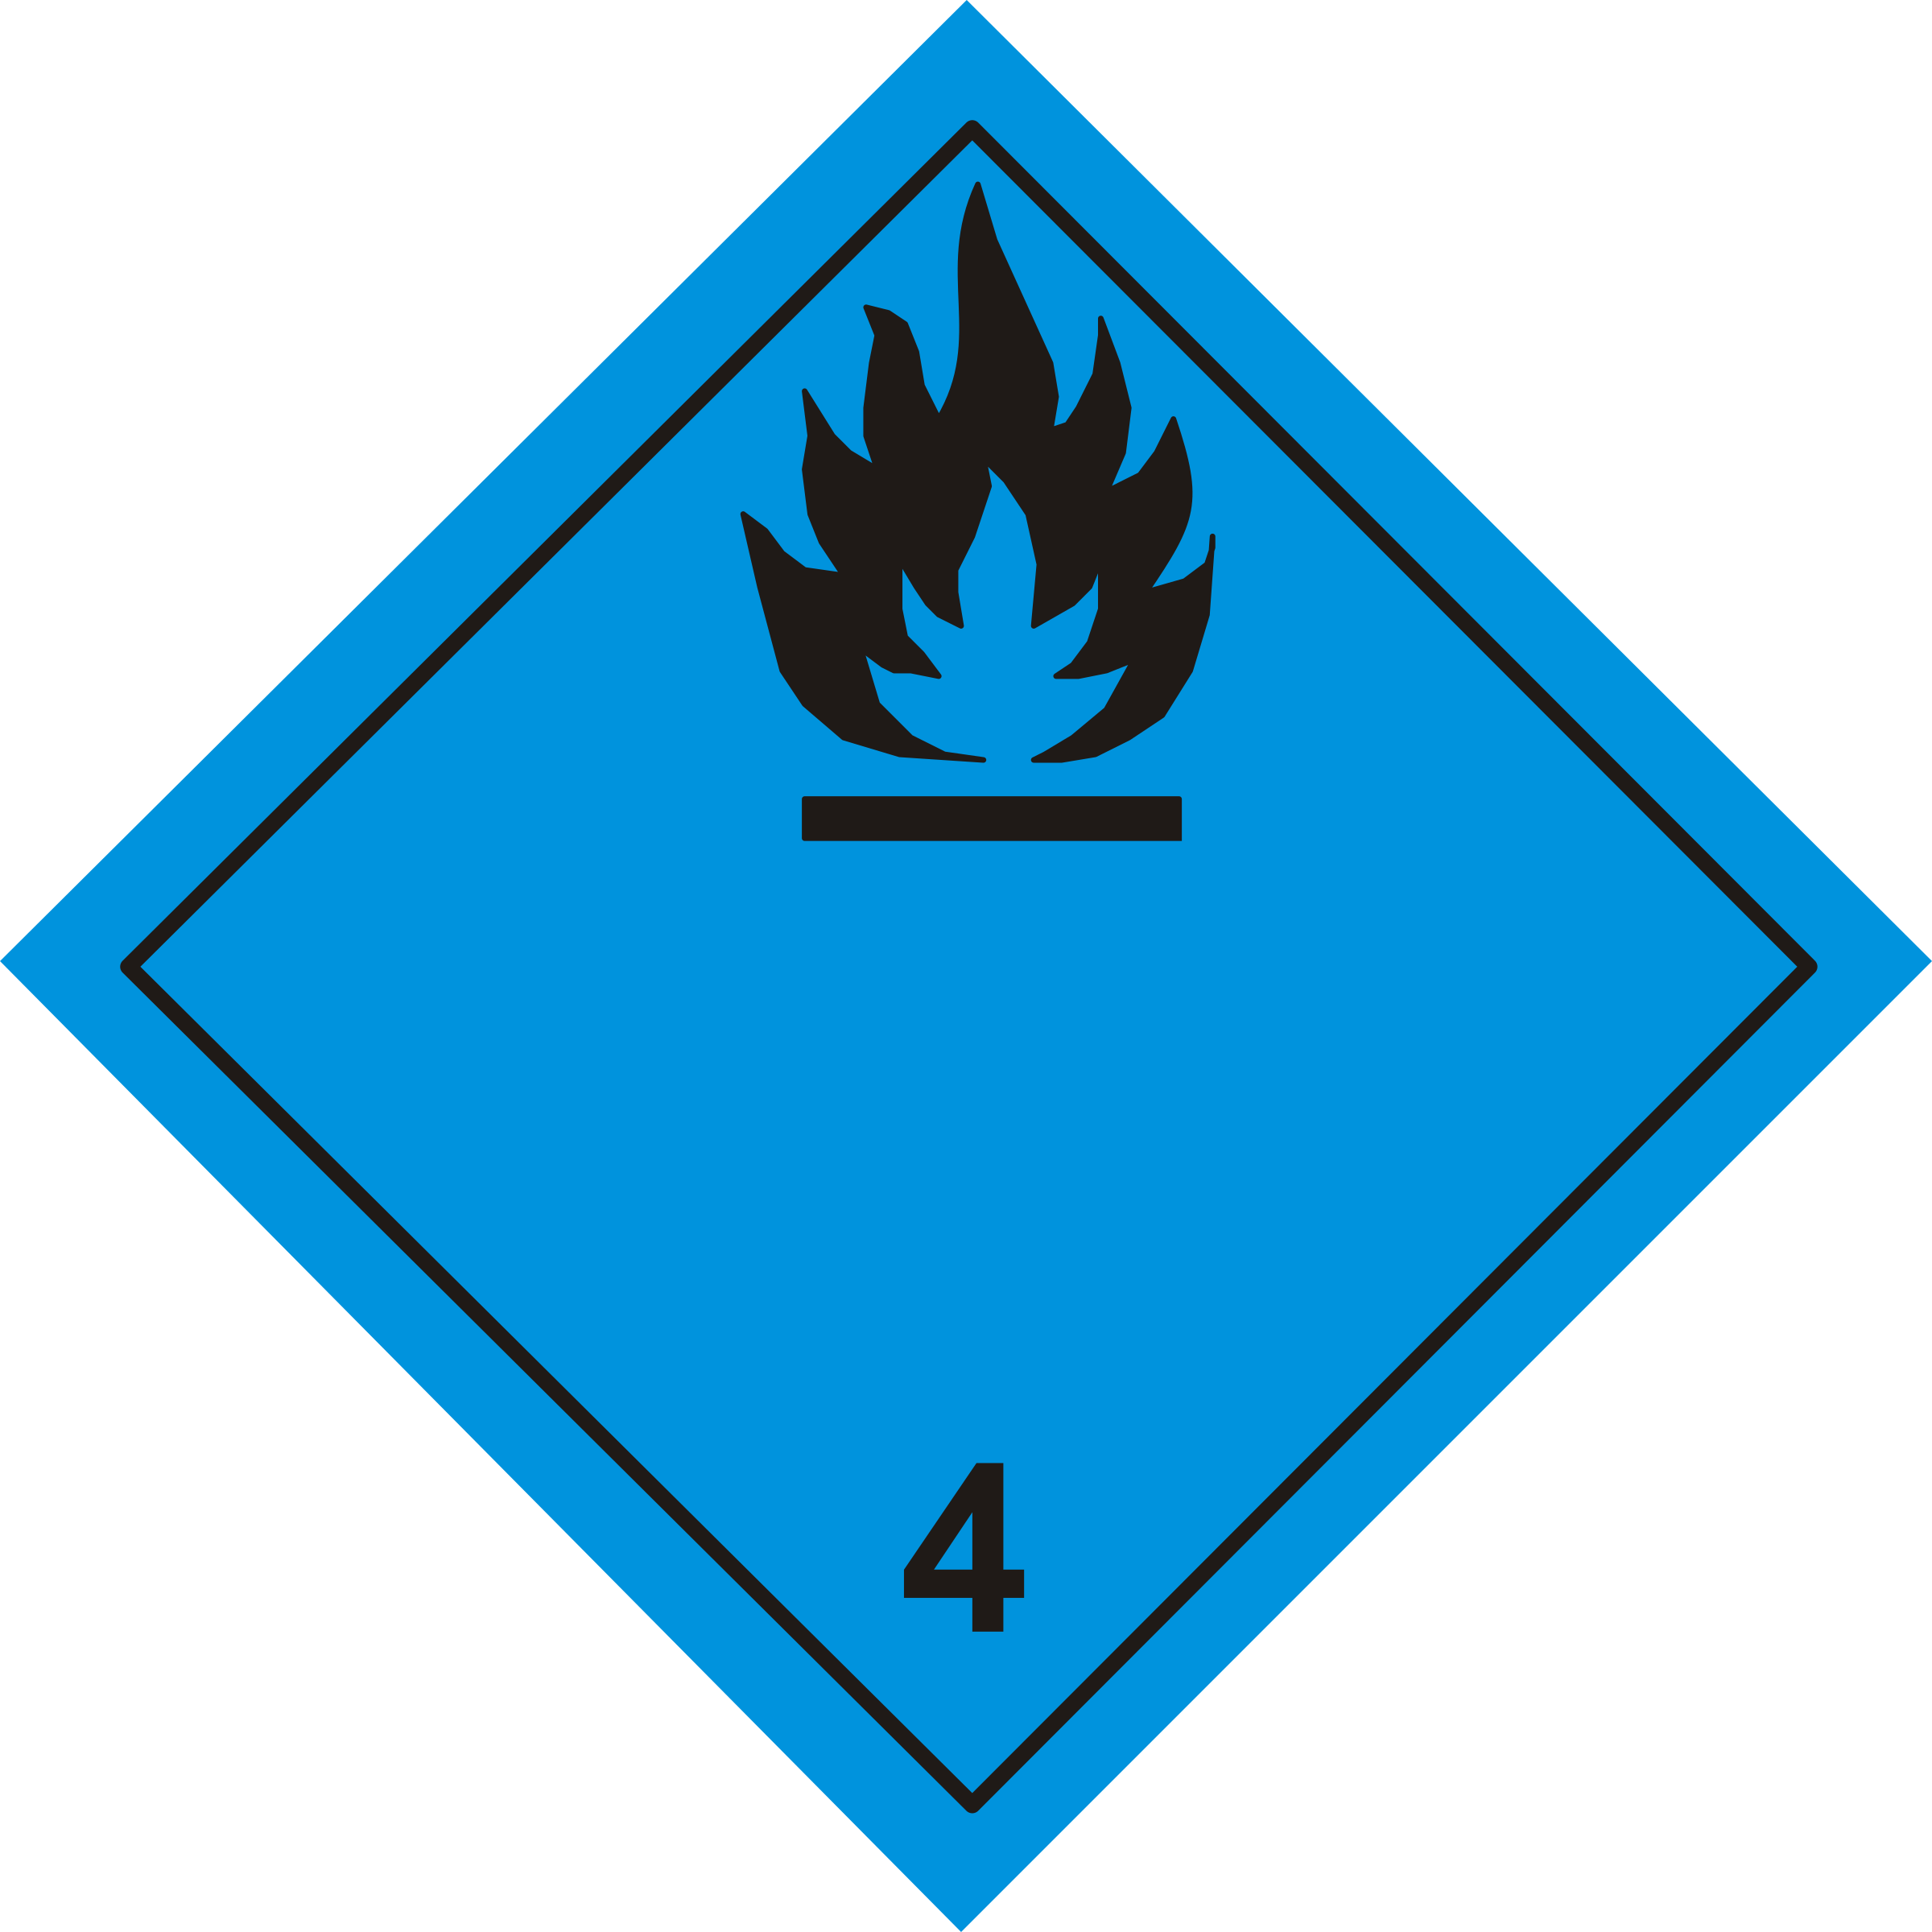 Danger clipart pictogram Pictogram 3 3 4 4